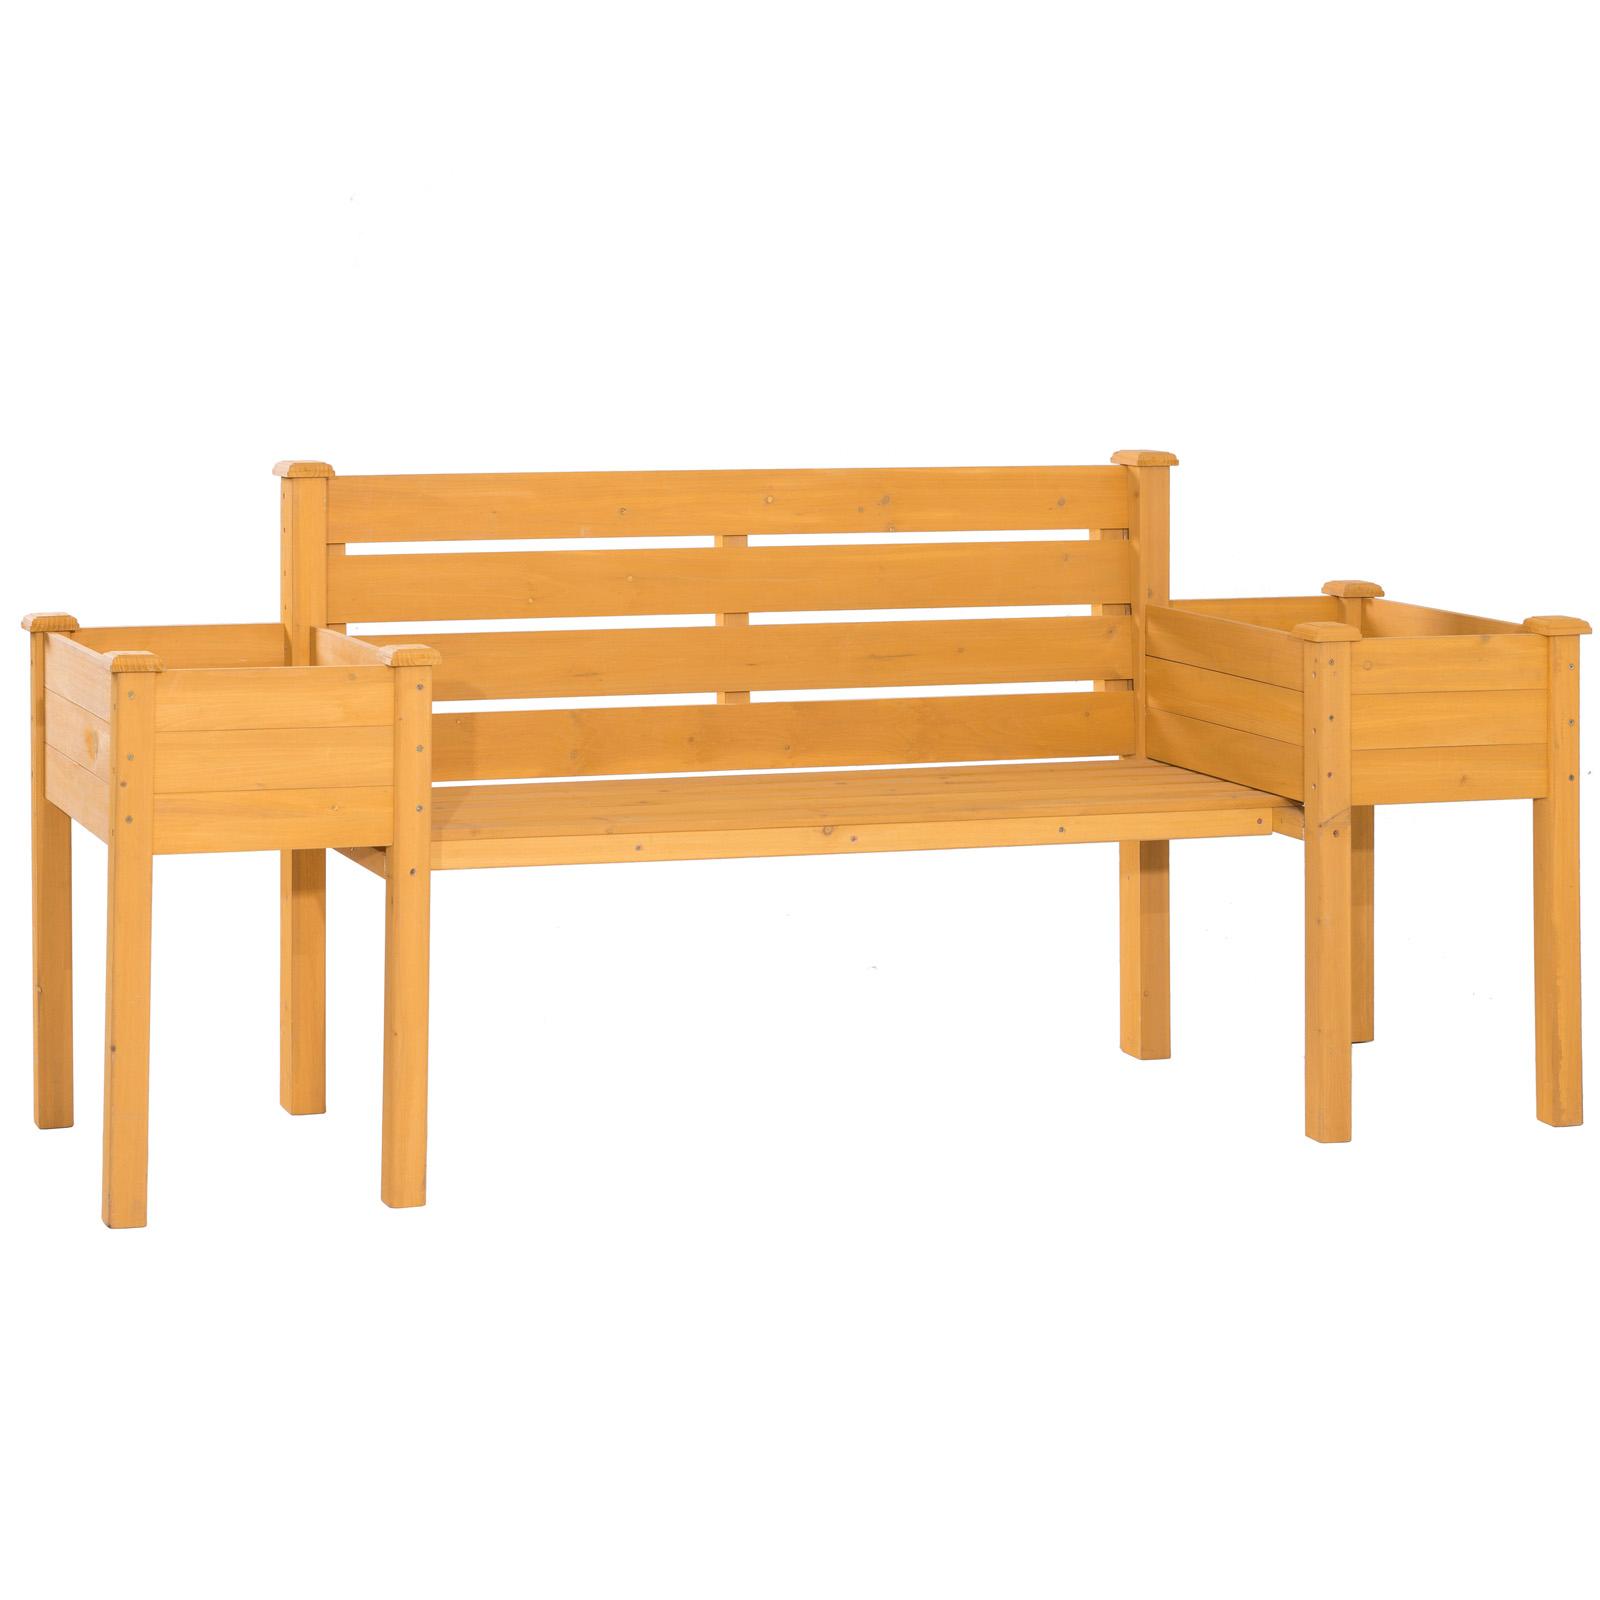 Wooden Garden Bench Chair With 2 Side Flower Planter Box Outdoor Furniture Decor Ebay